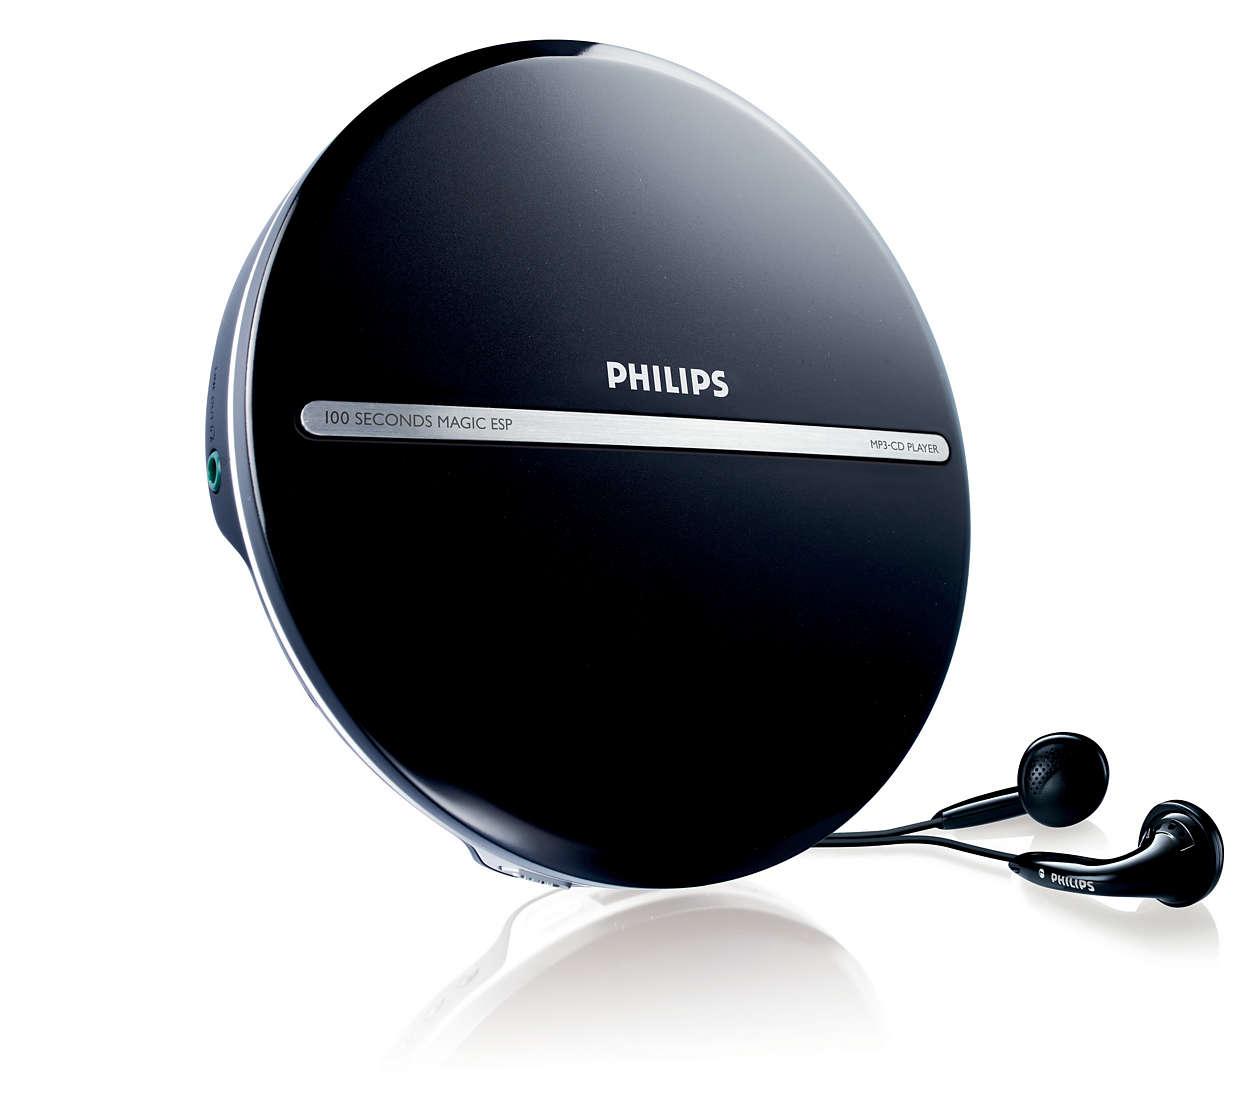 Disfruta de la música MP3 a prueba de saltos